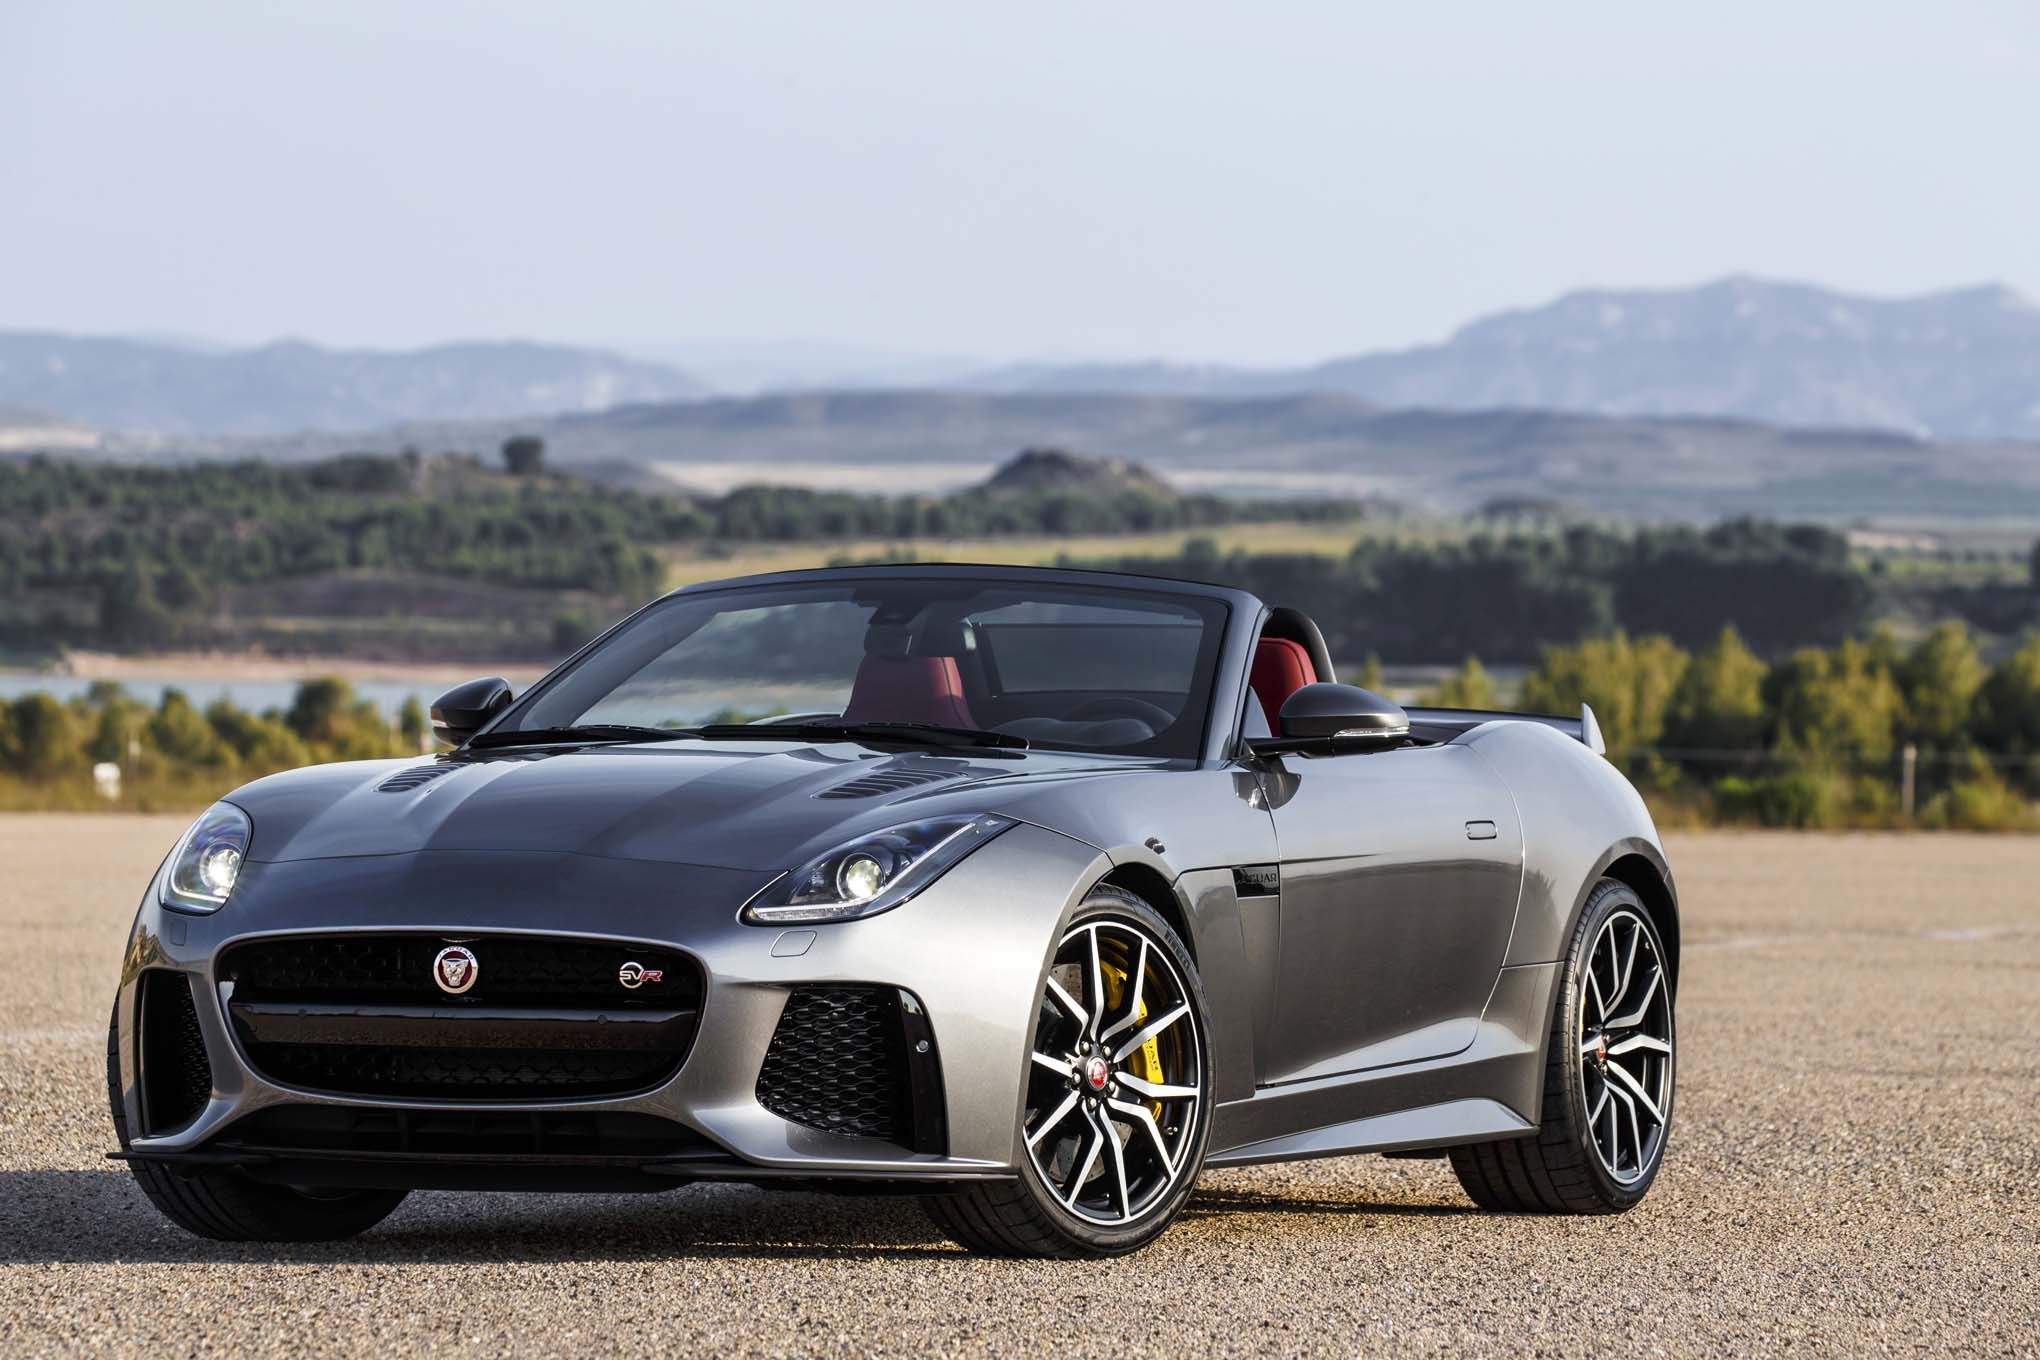 Jaguar ftype svr convertible rear hd wallpaper my other car is in